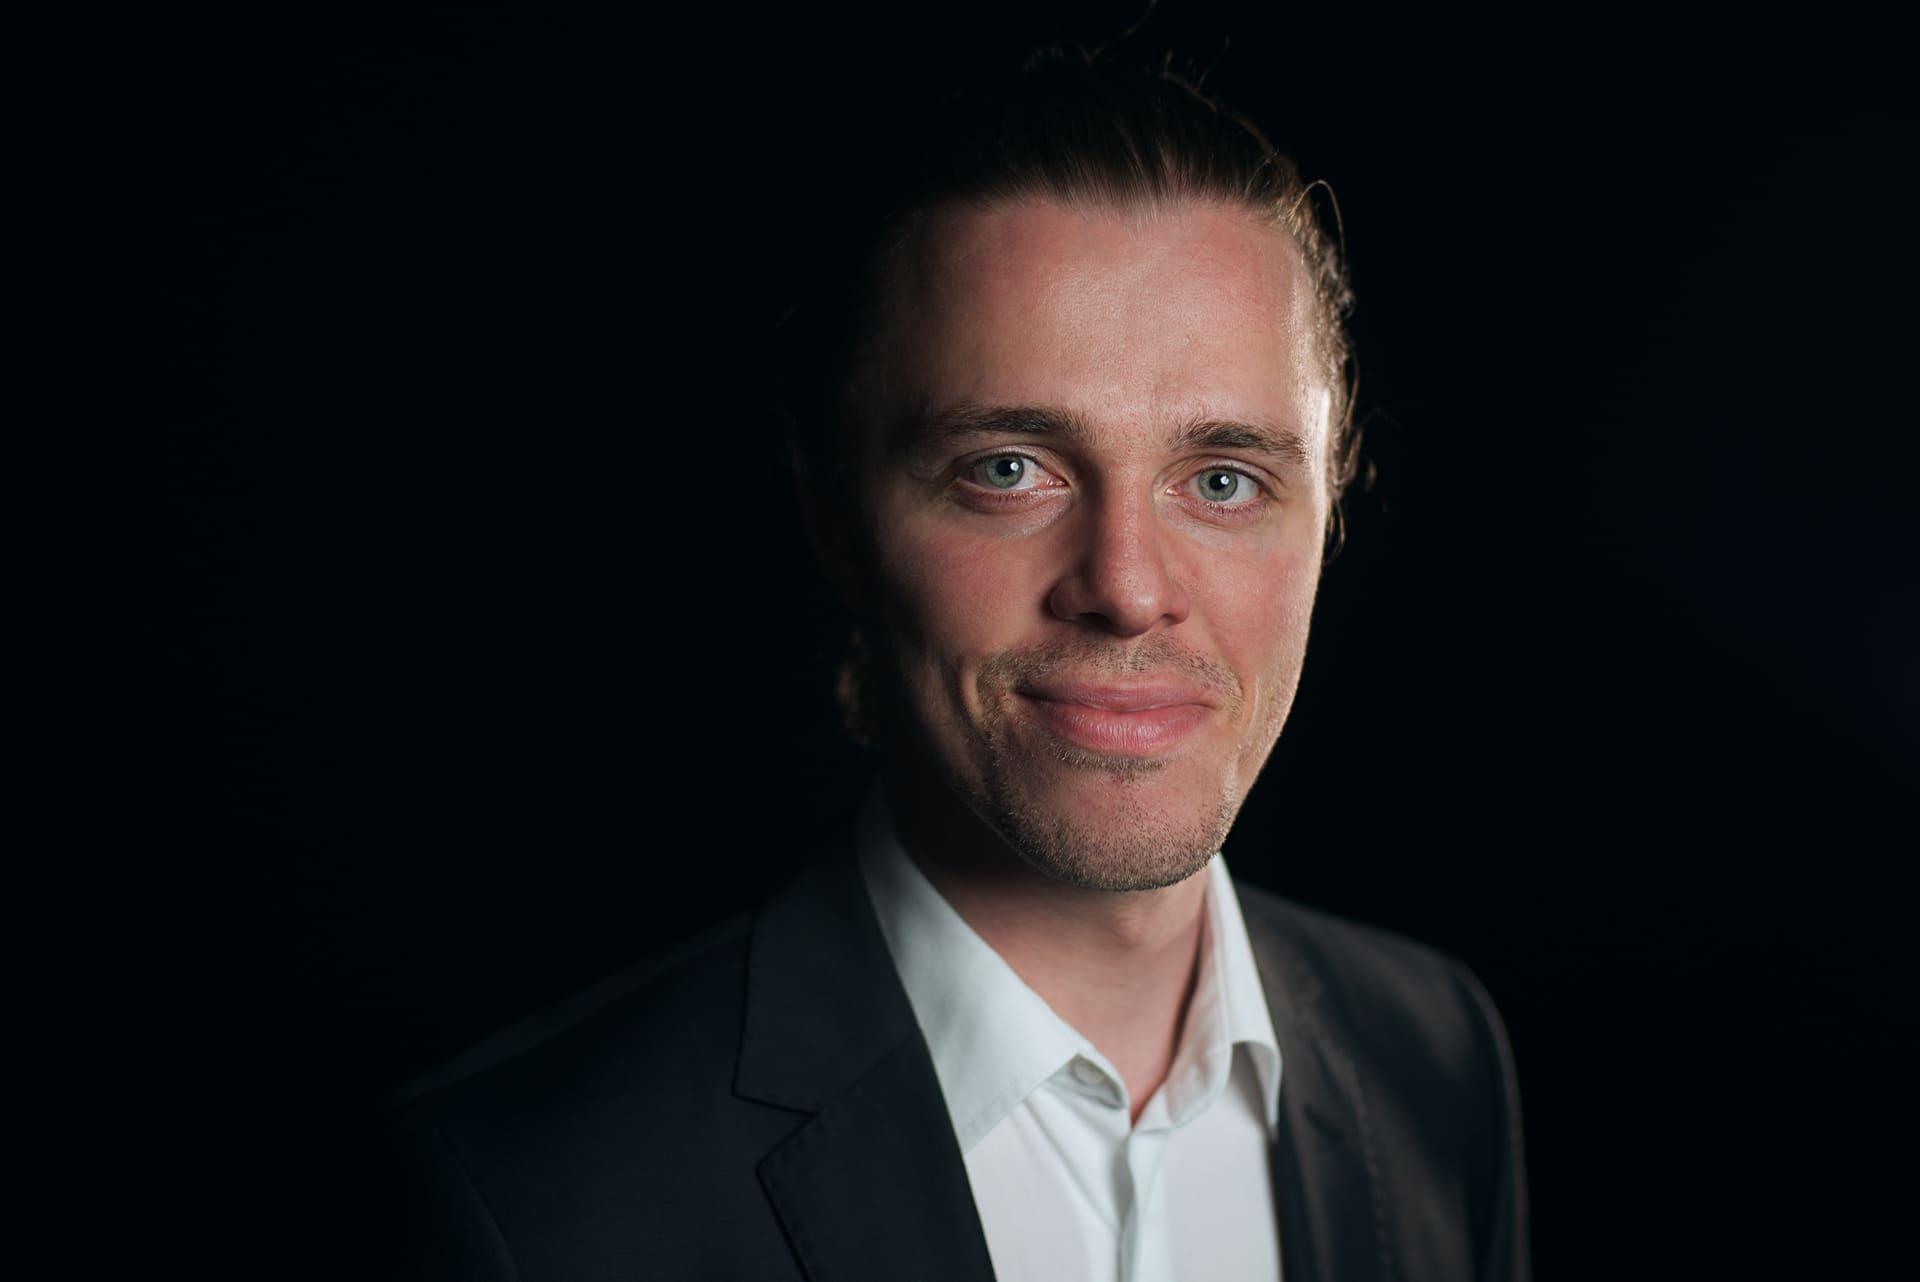 David Risberg 2  - photo by Helgi Reynisson